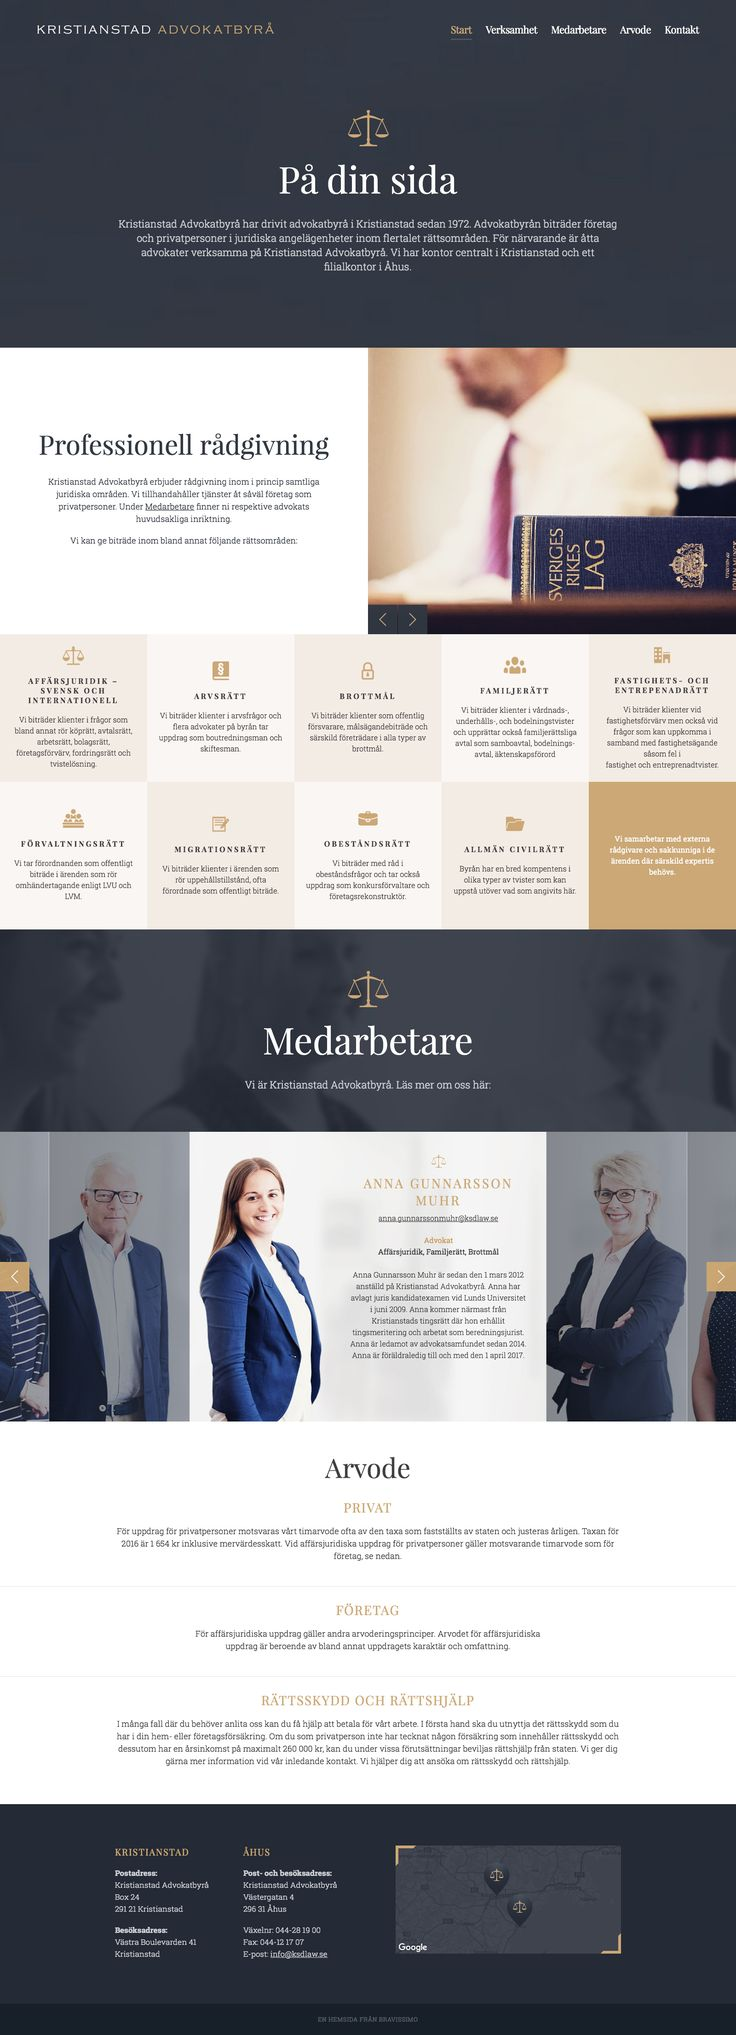 Kristianstad Attorneys Lawyer Website Design #lawyerwebsites #lawfirmwebsite…